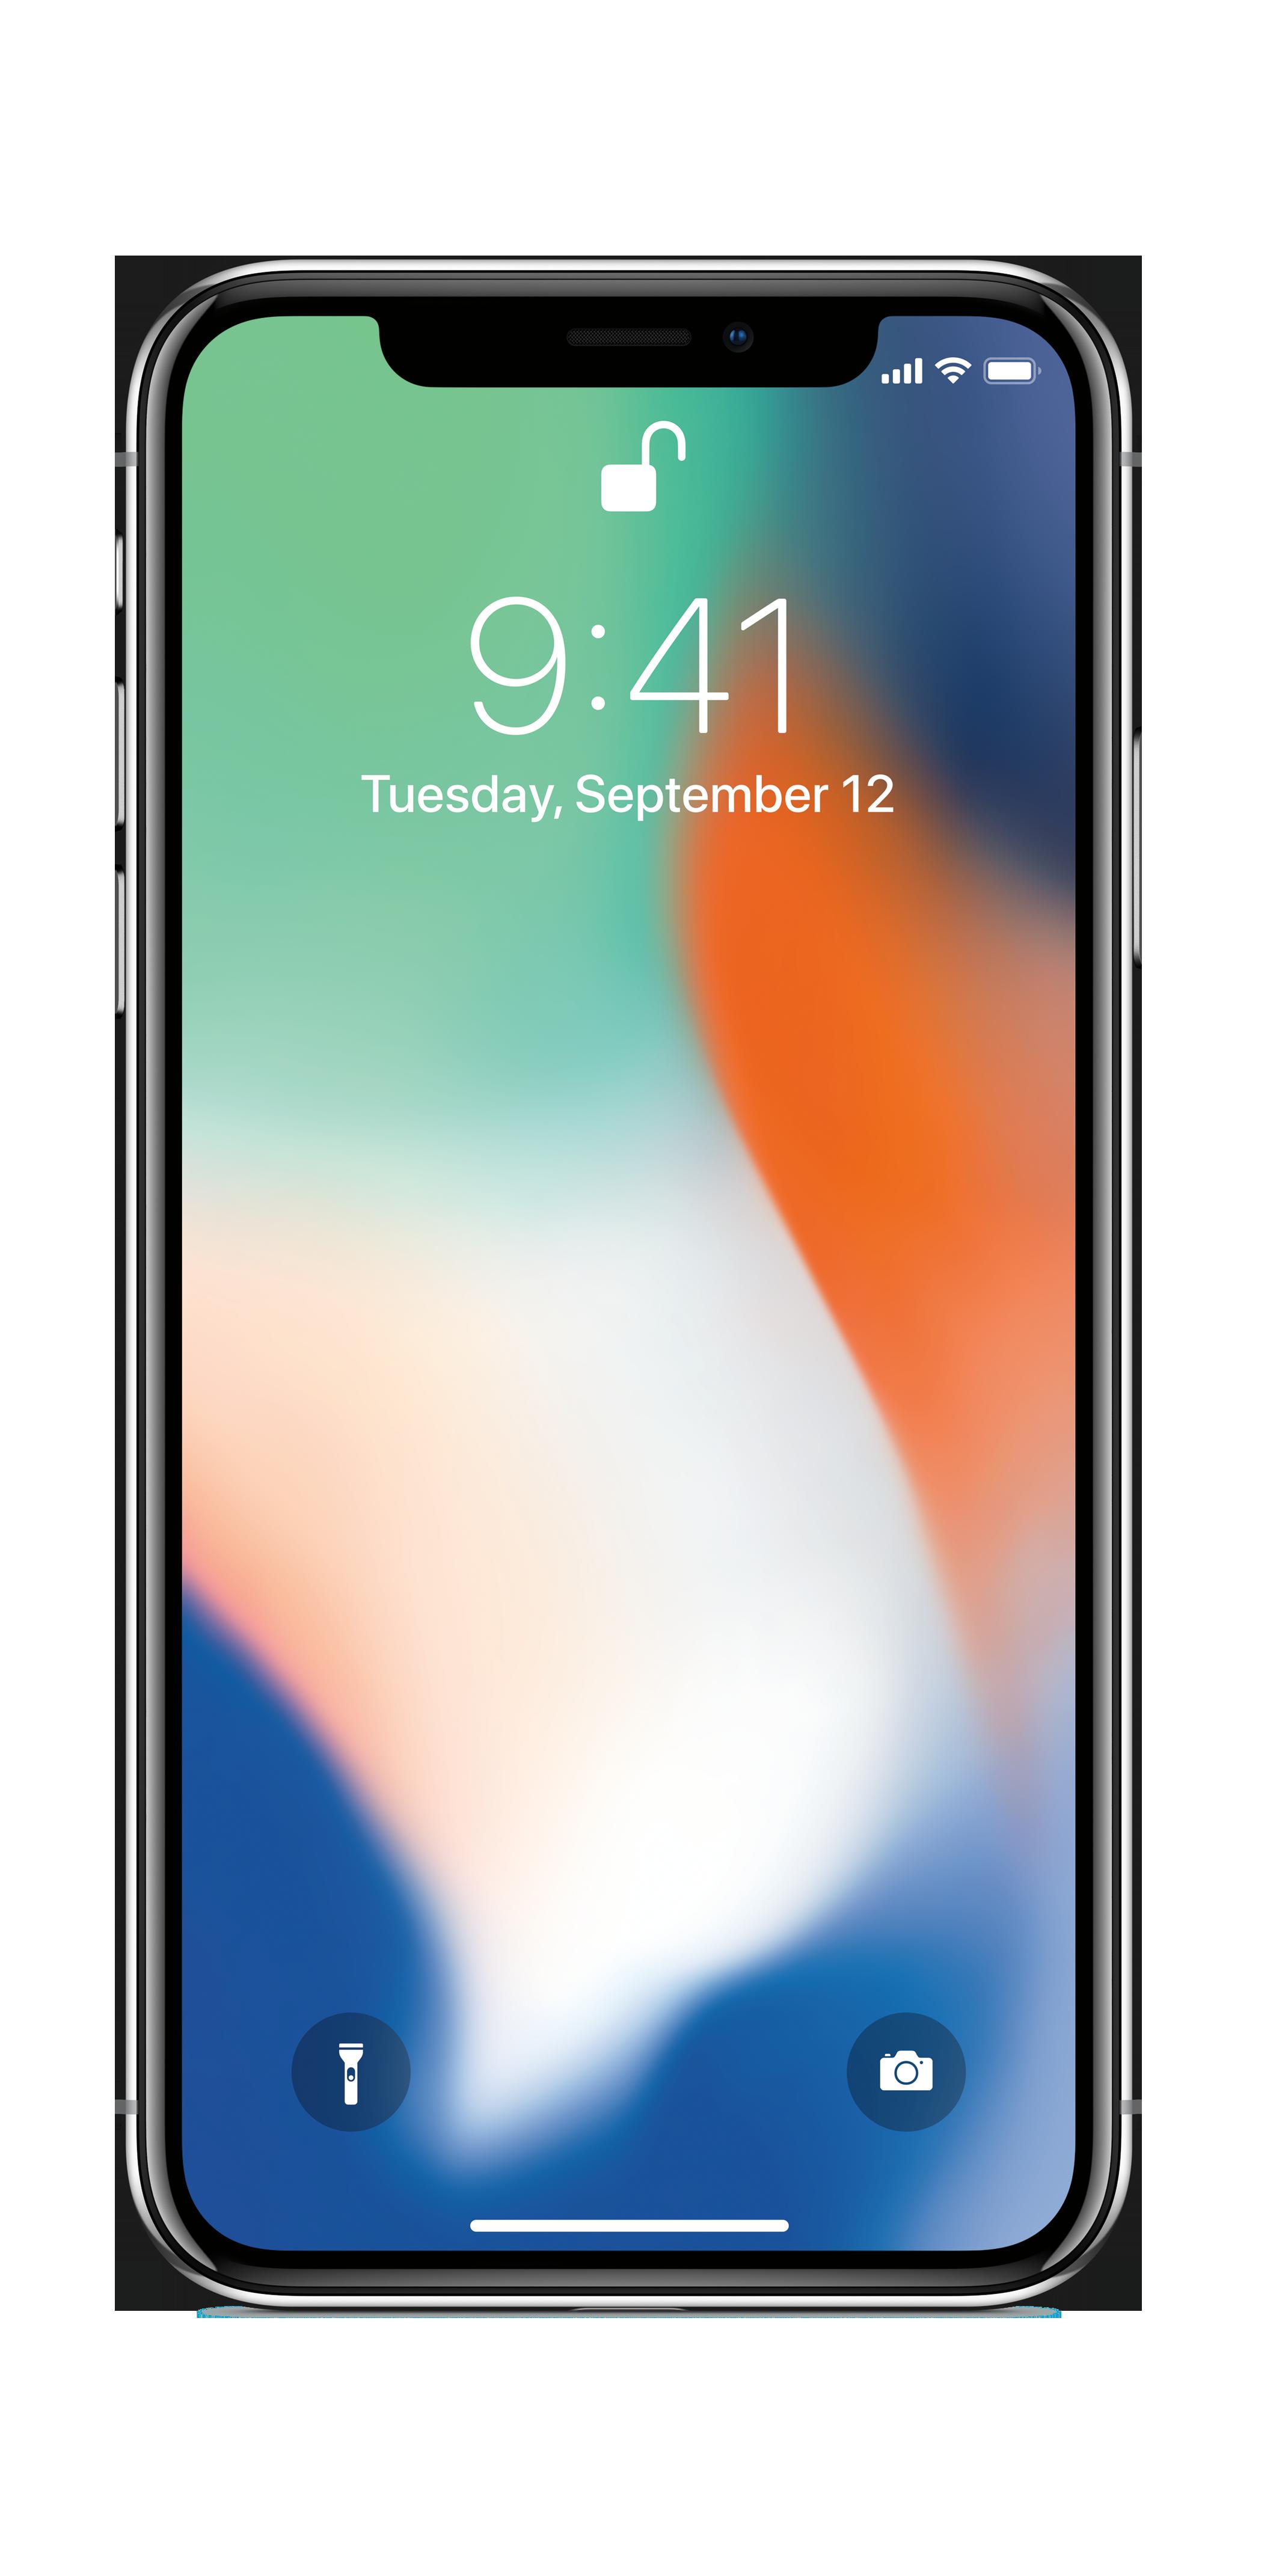 Iphone X Png Image Purepng Free Transparent Cc0 Png